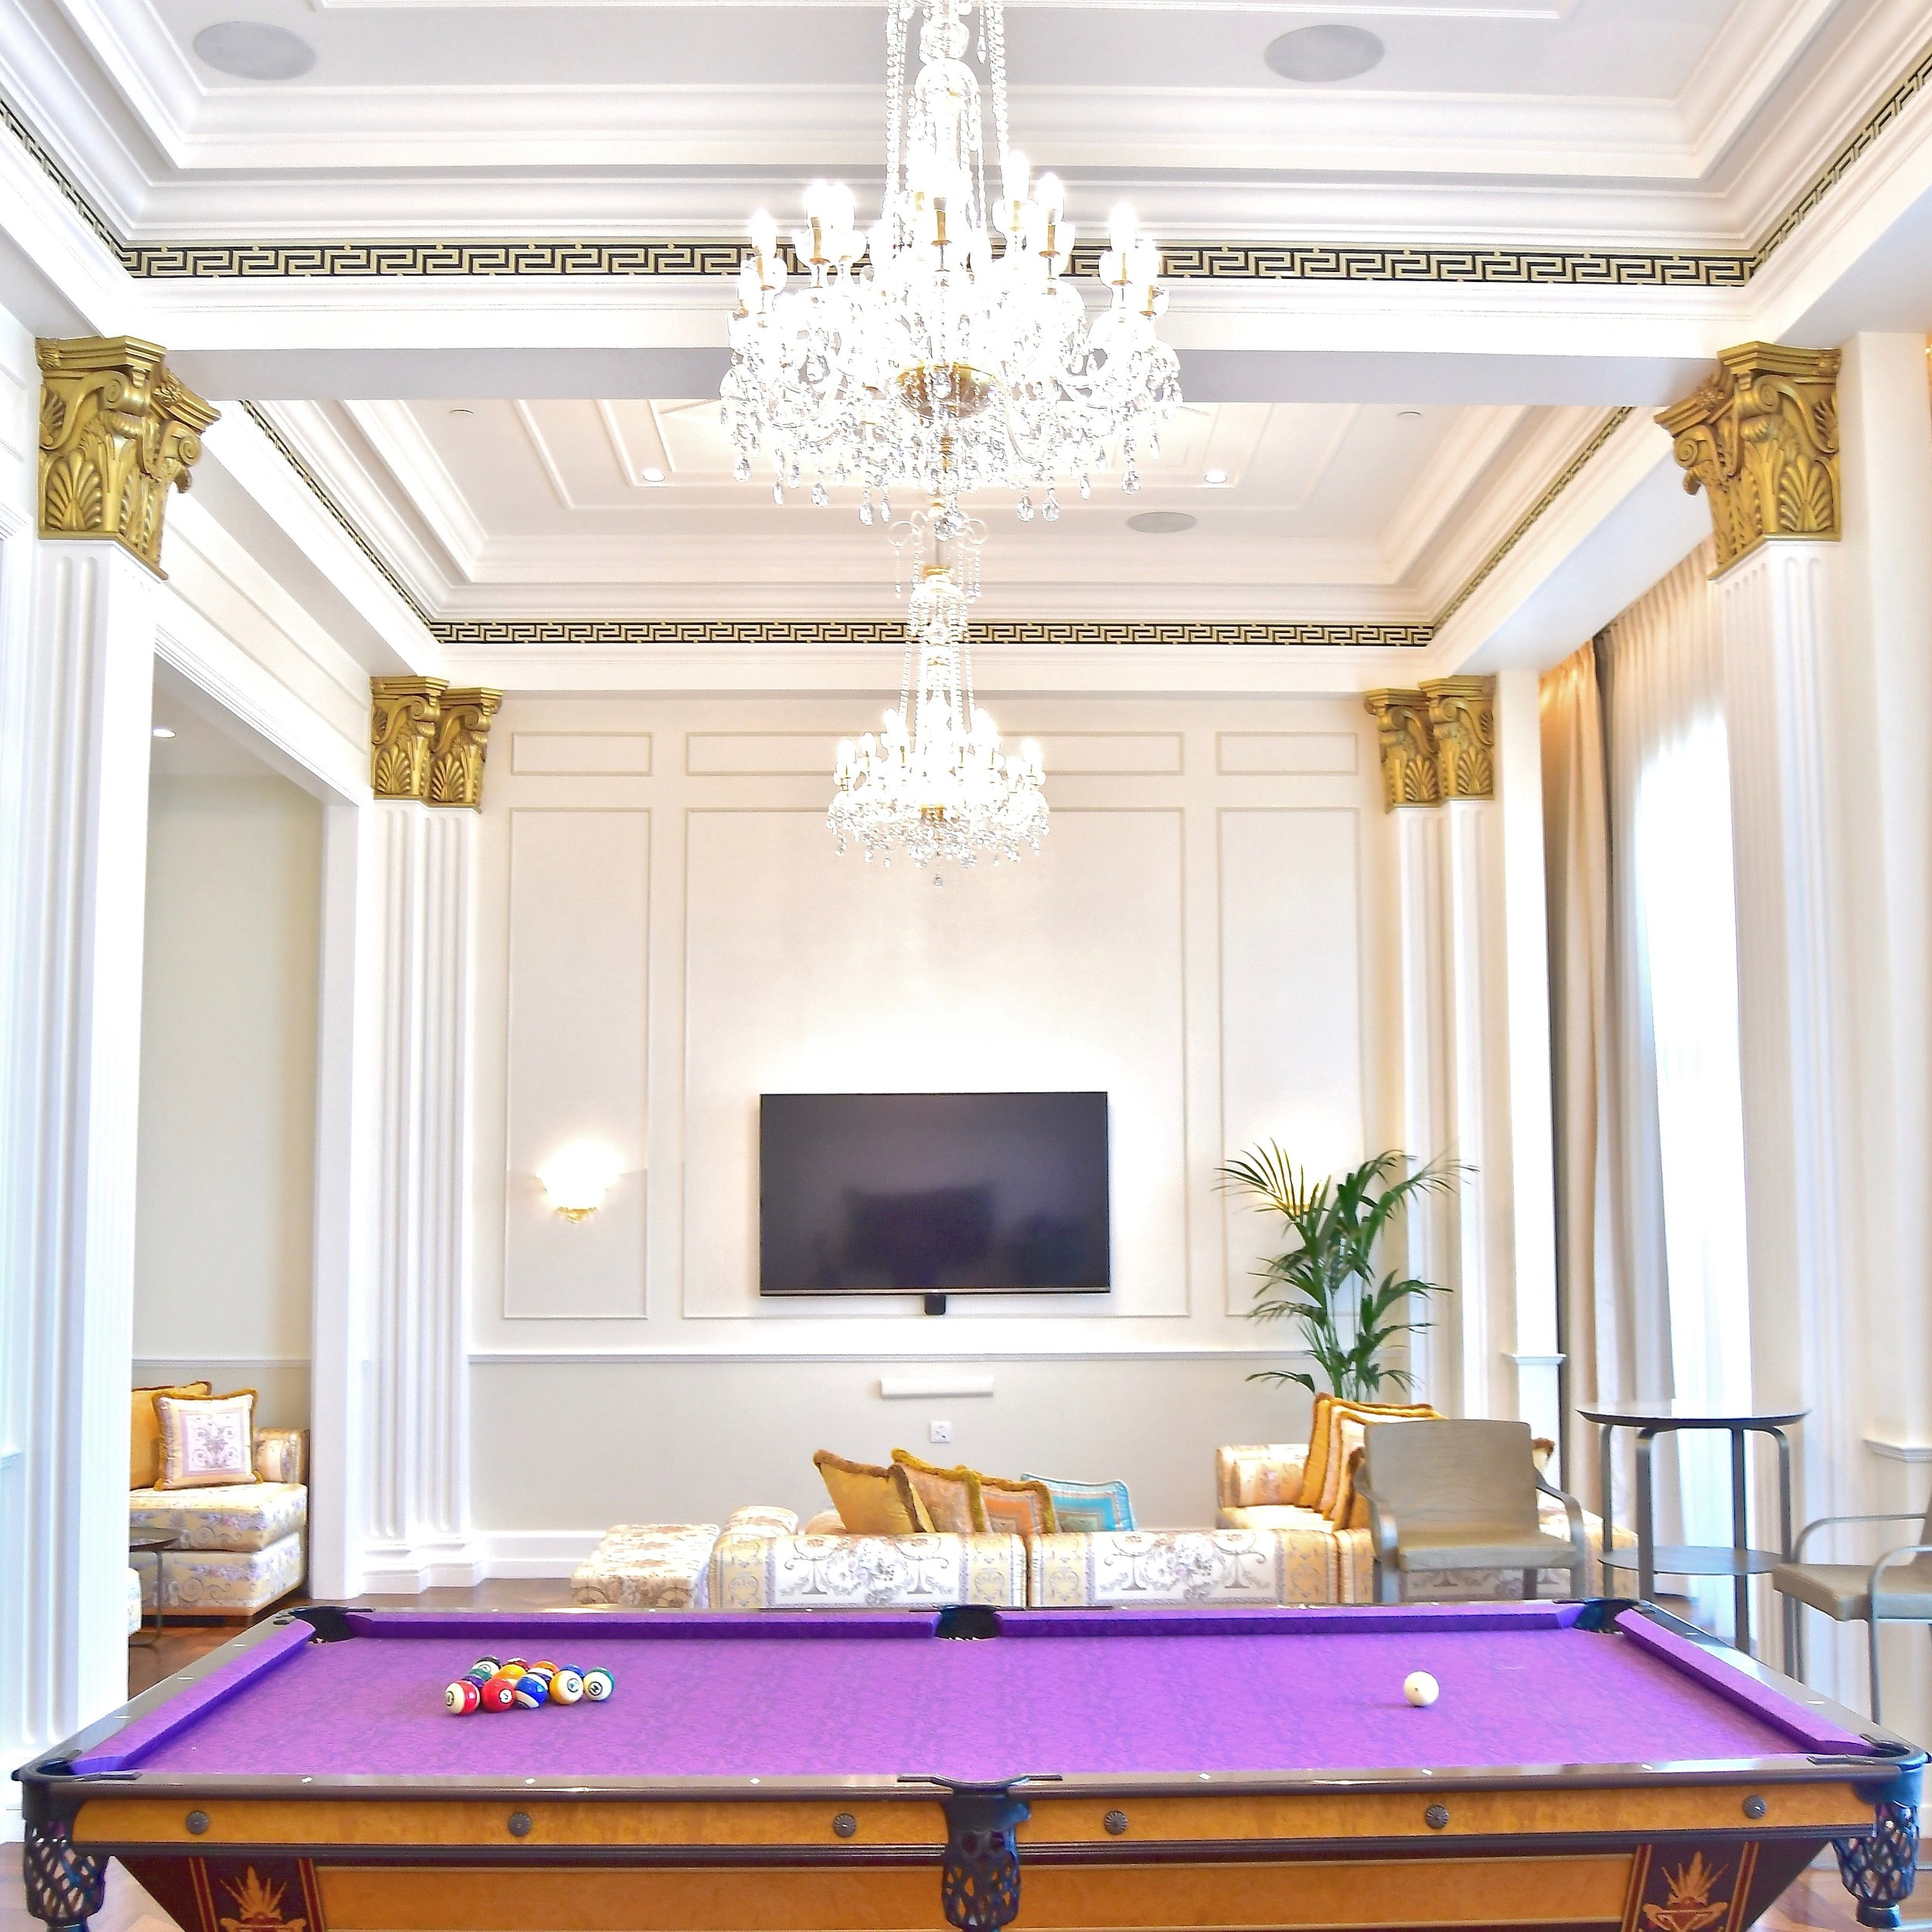 Imperial Suite - Billiard Room (Palazzo Versace Dubai)